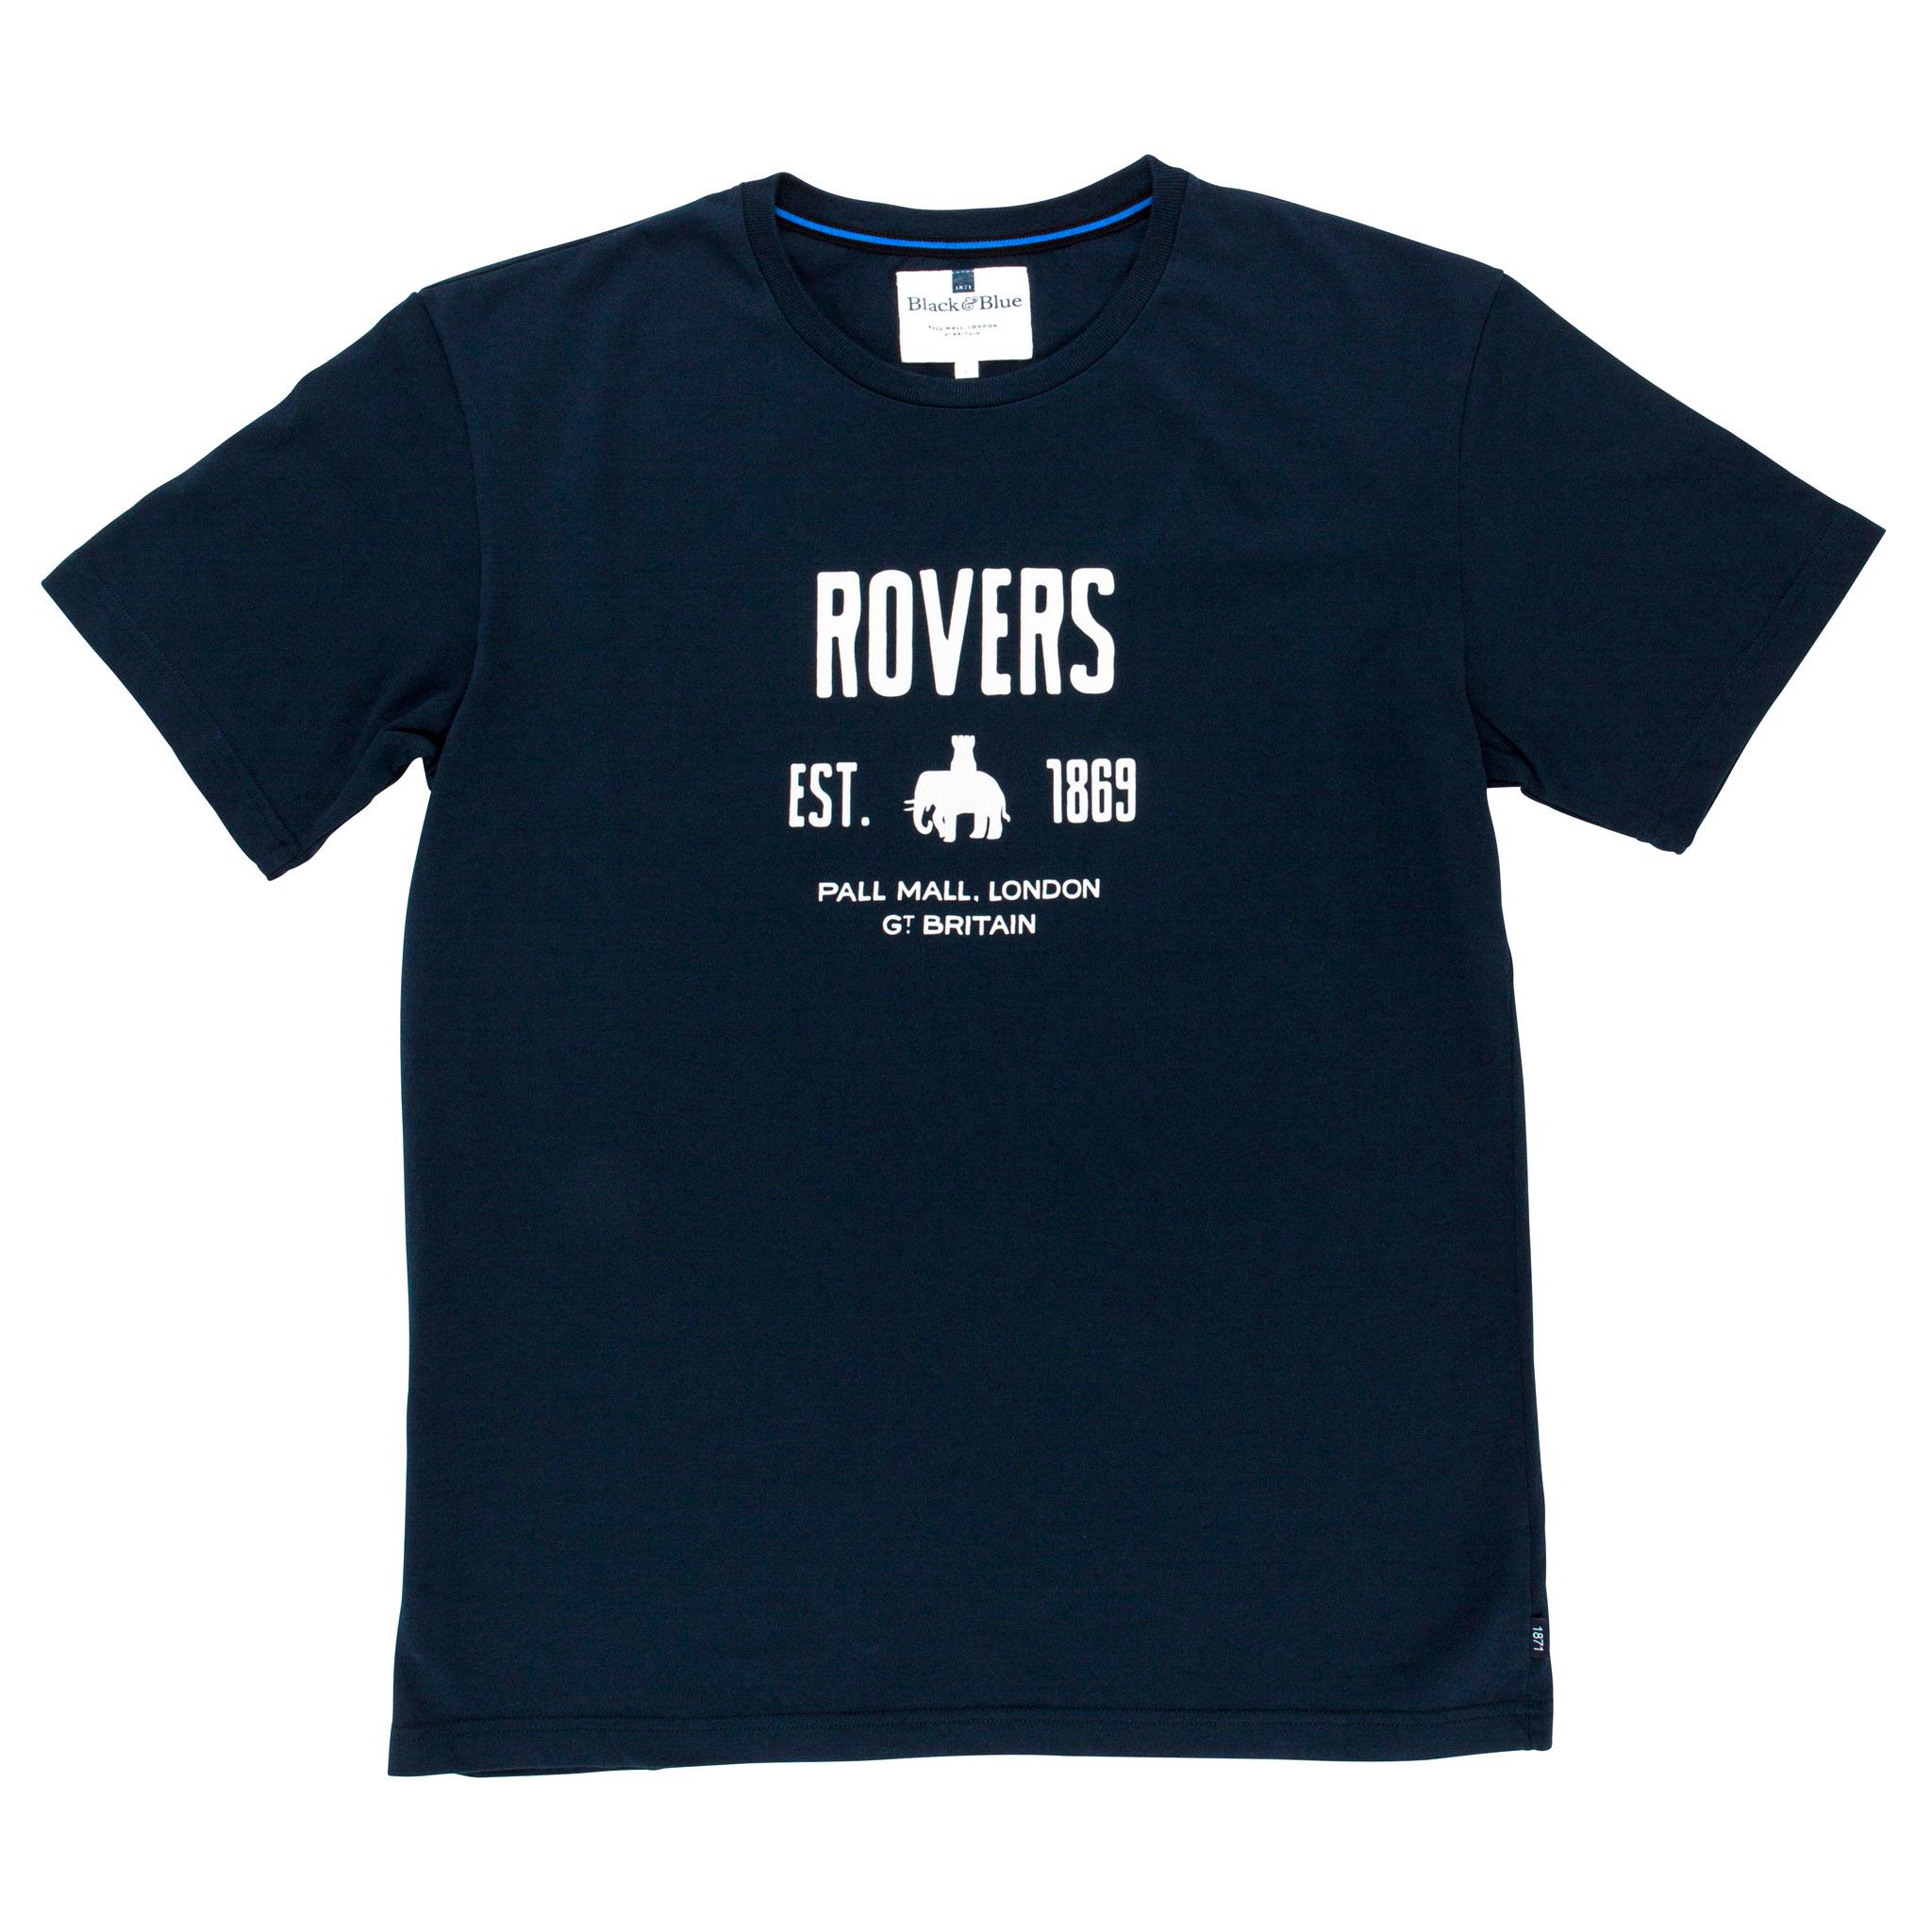 Rovers Navy T-shirt